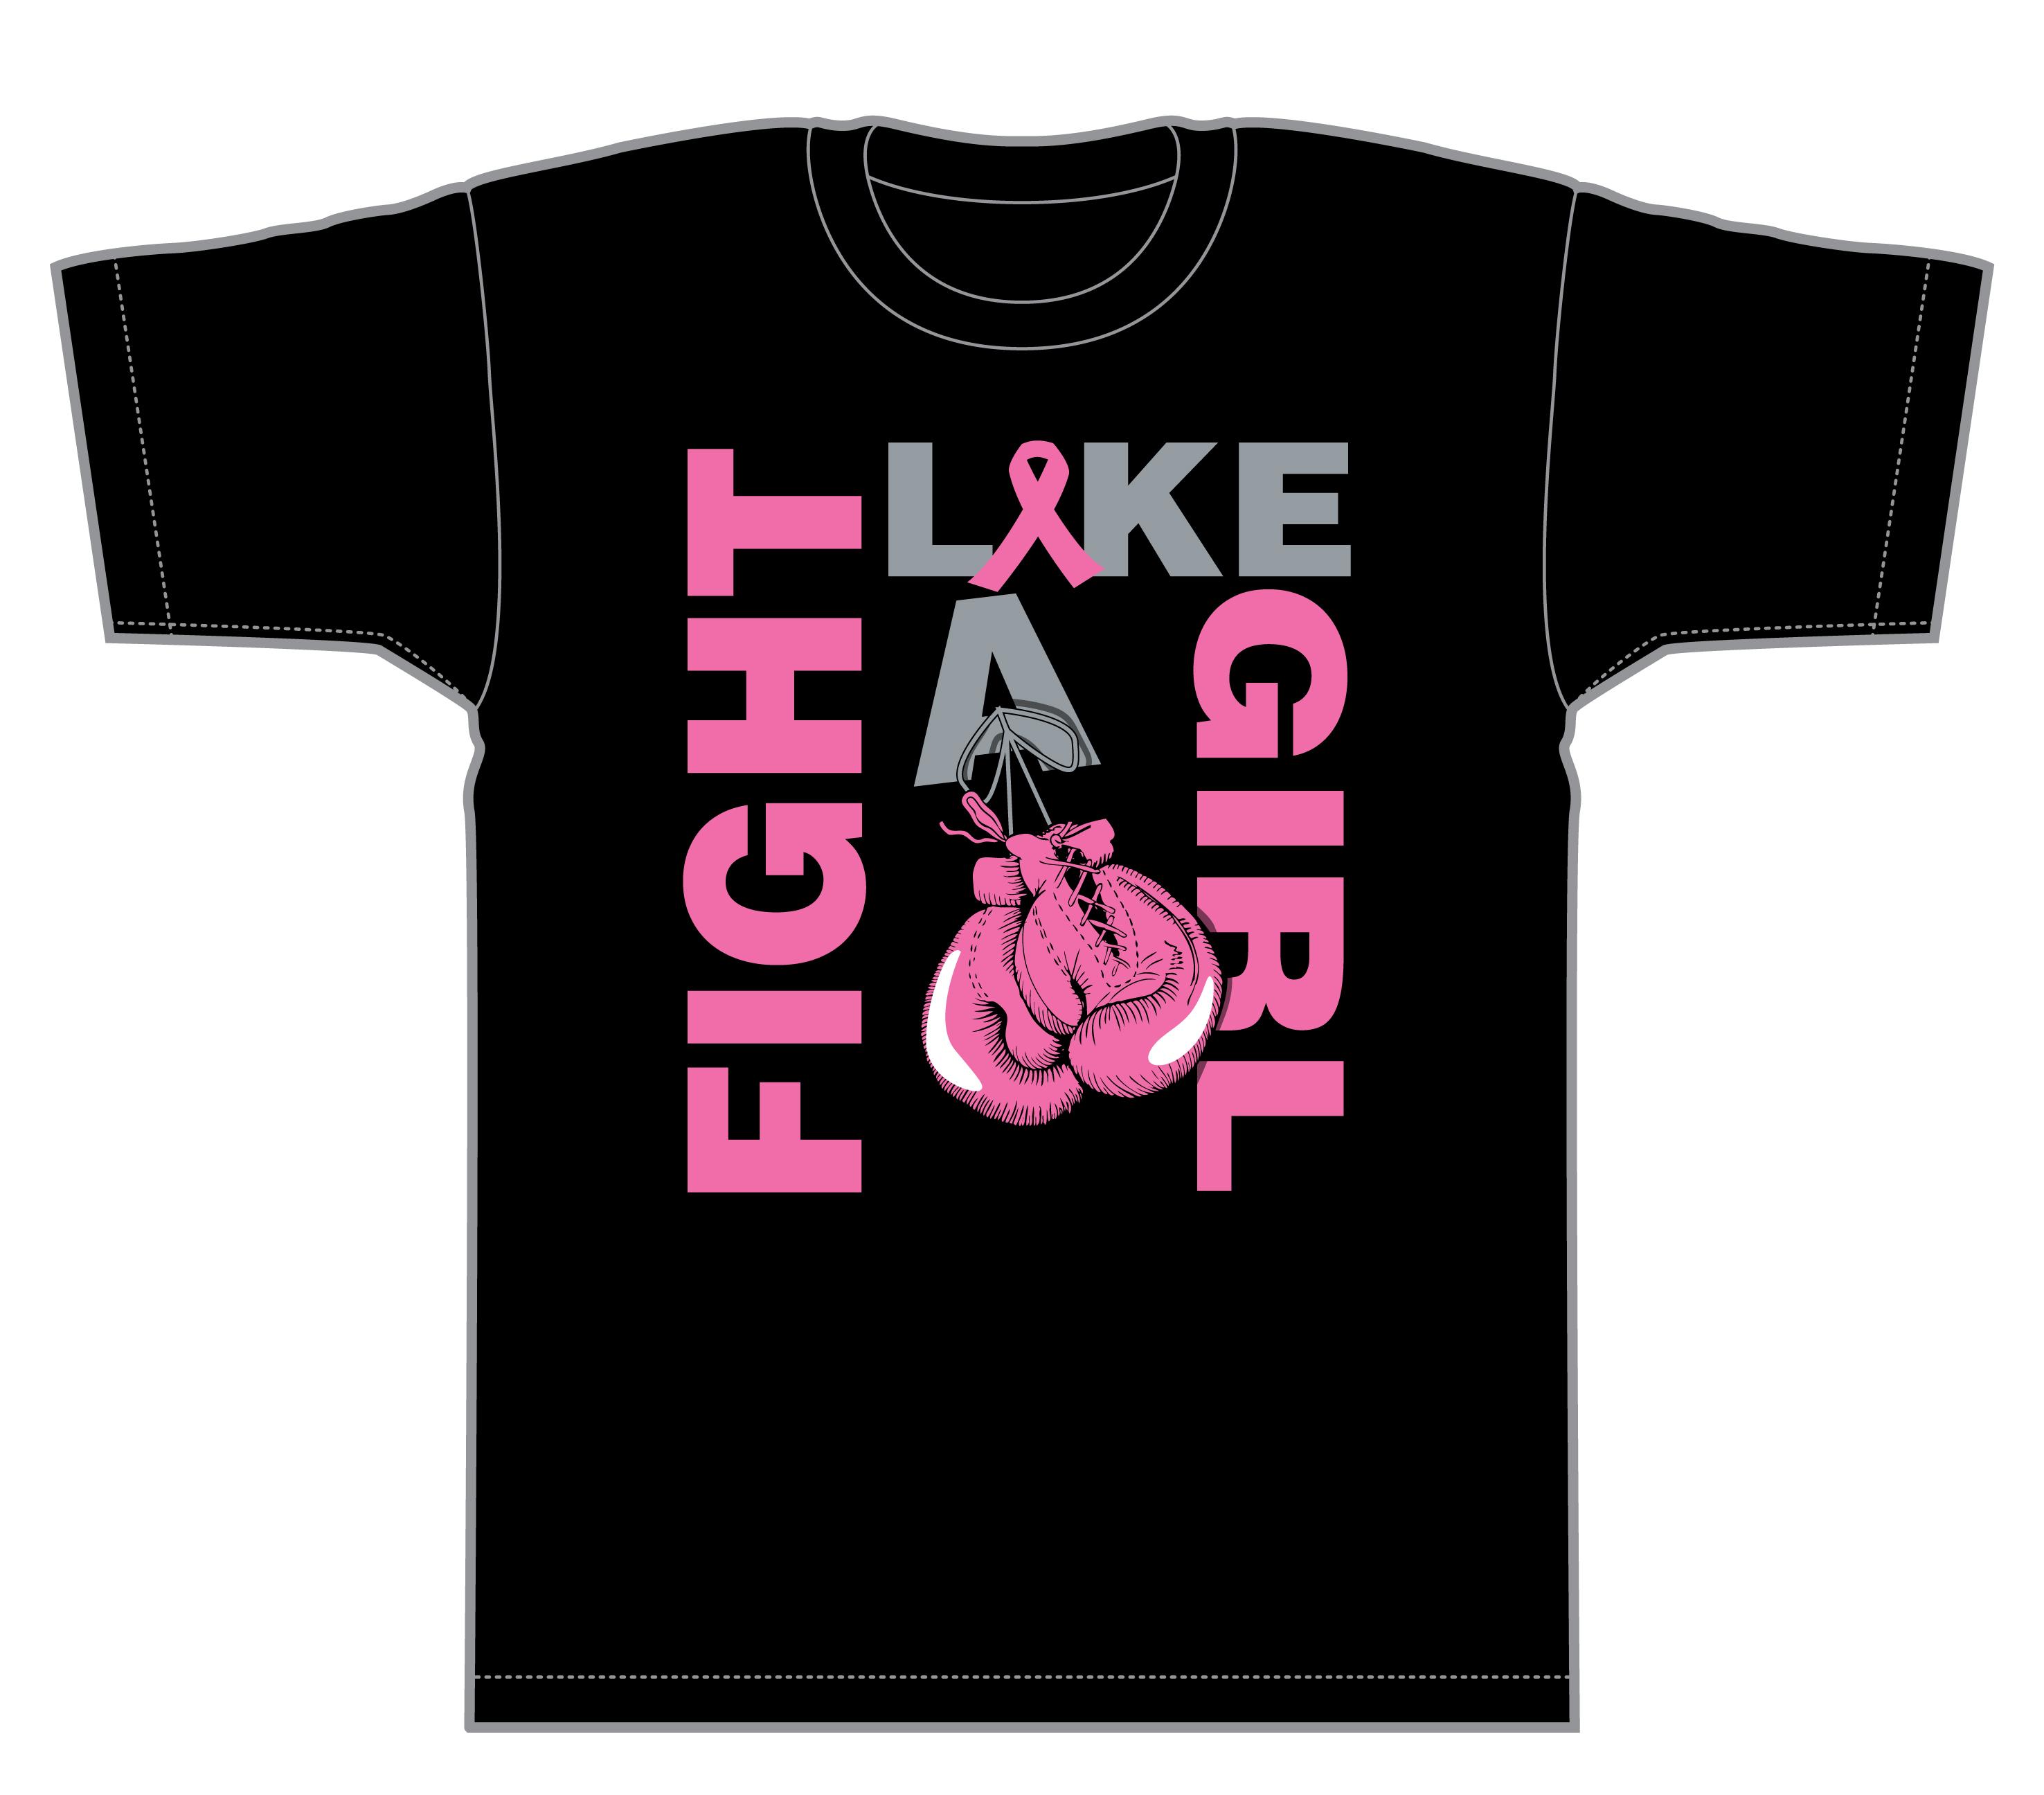 Bryan Rocha - Fight like a girl - t-shirt design 0c012db7b